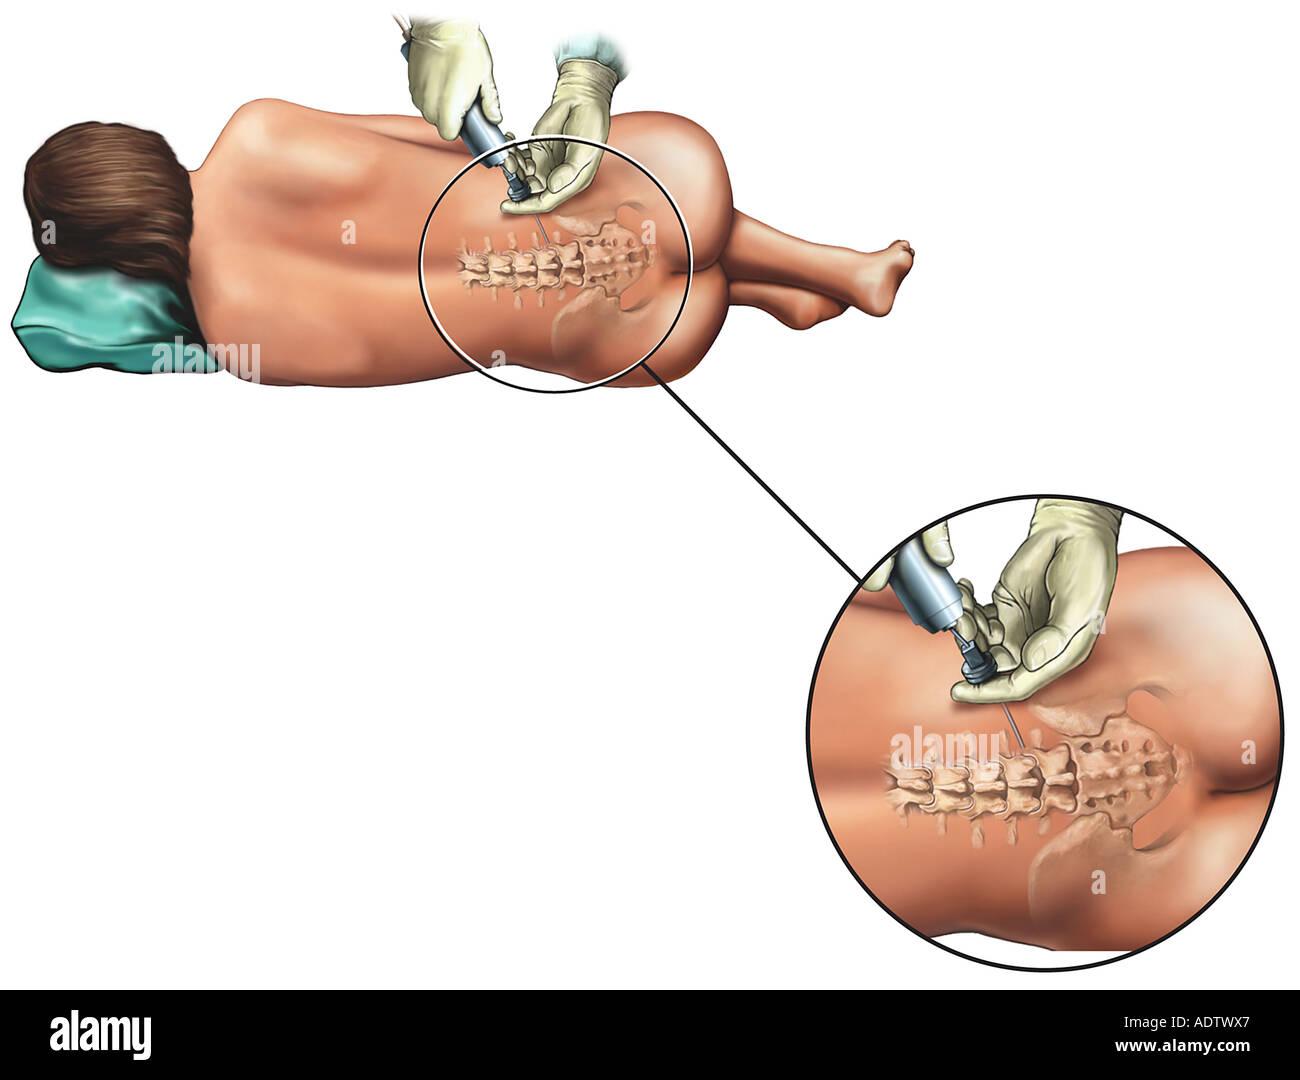 Epidural Nerve Block Injection - Stock Image